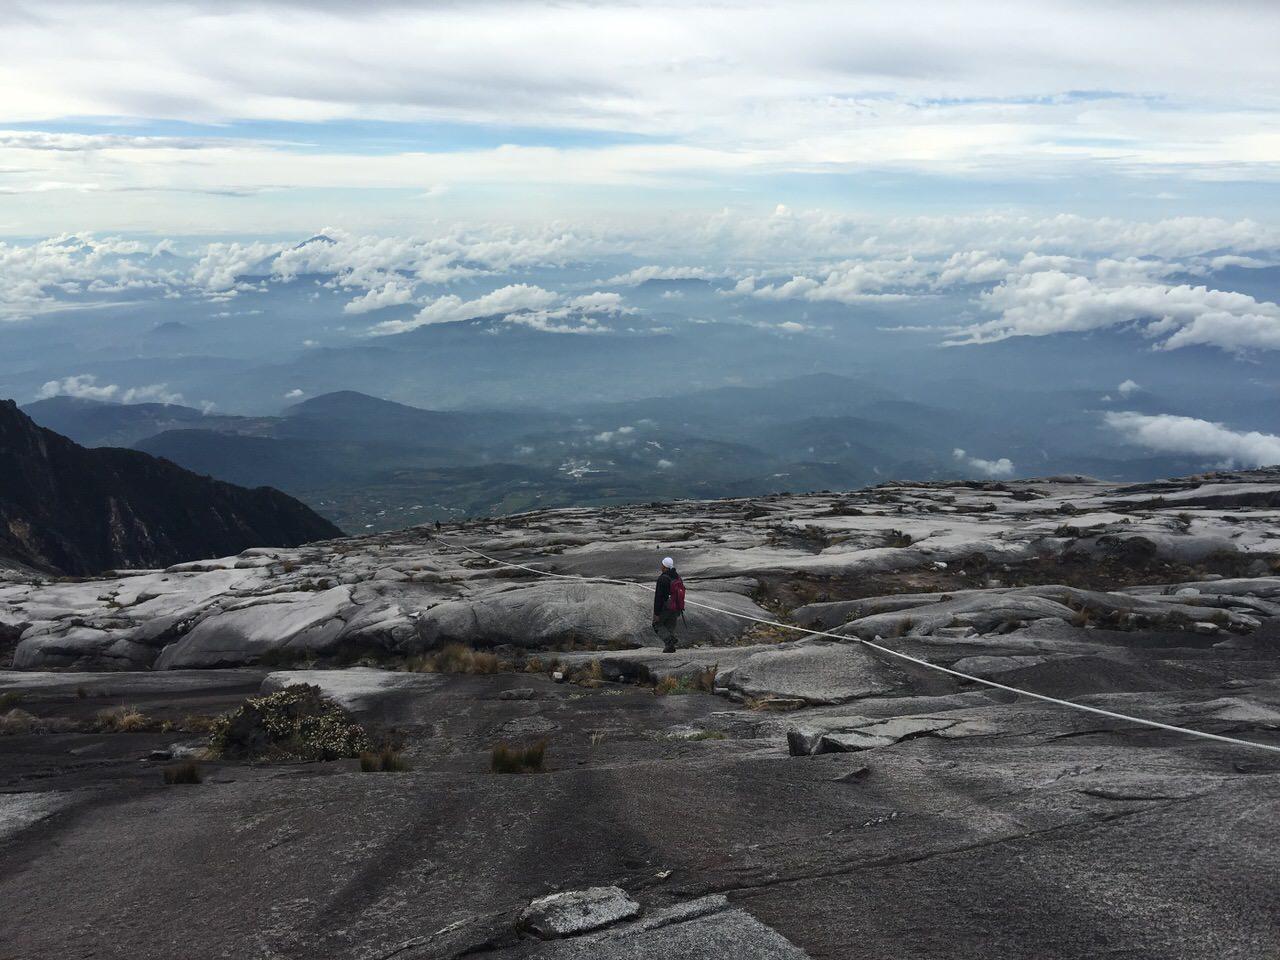 Kota Kinabalu climbing 4179